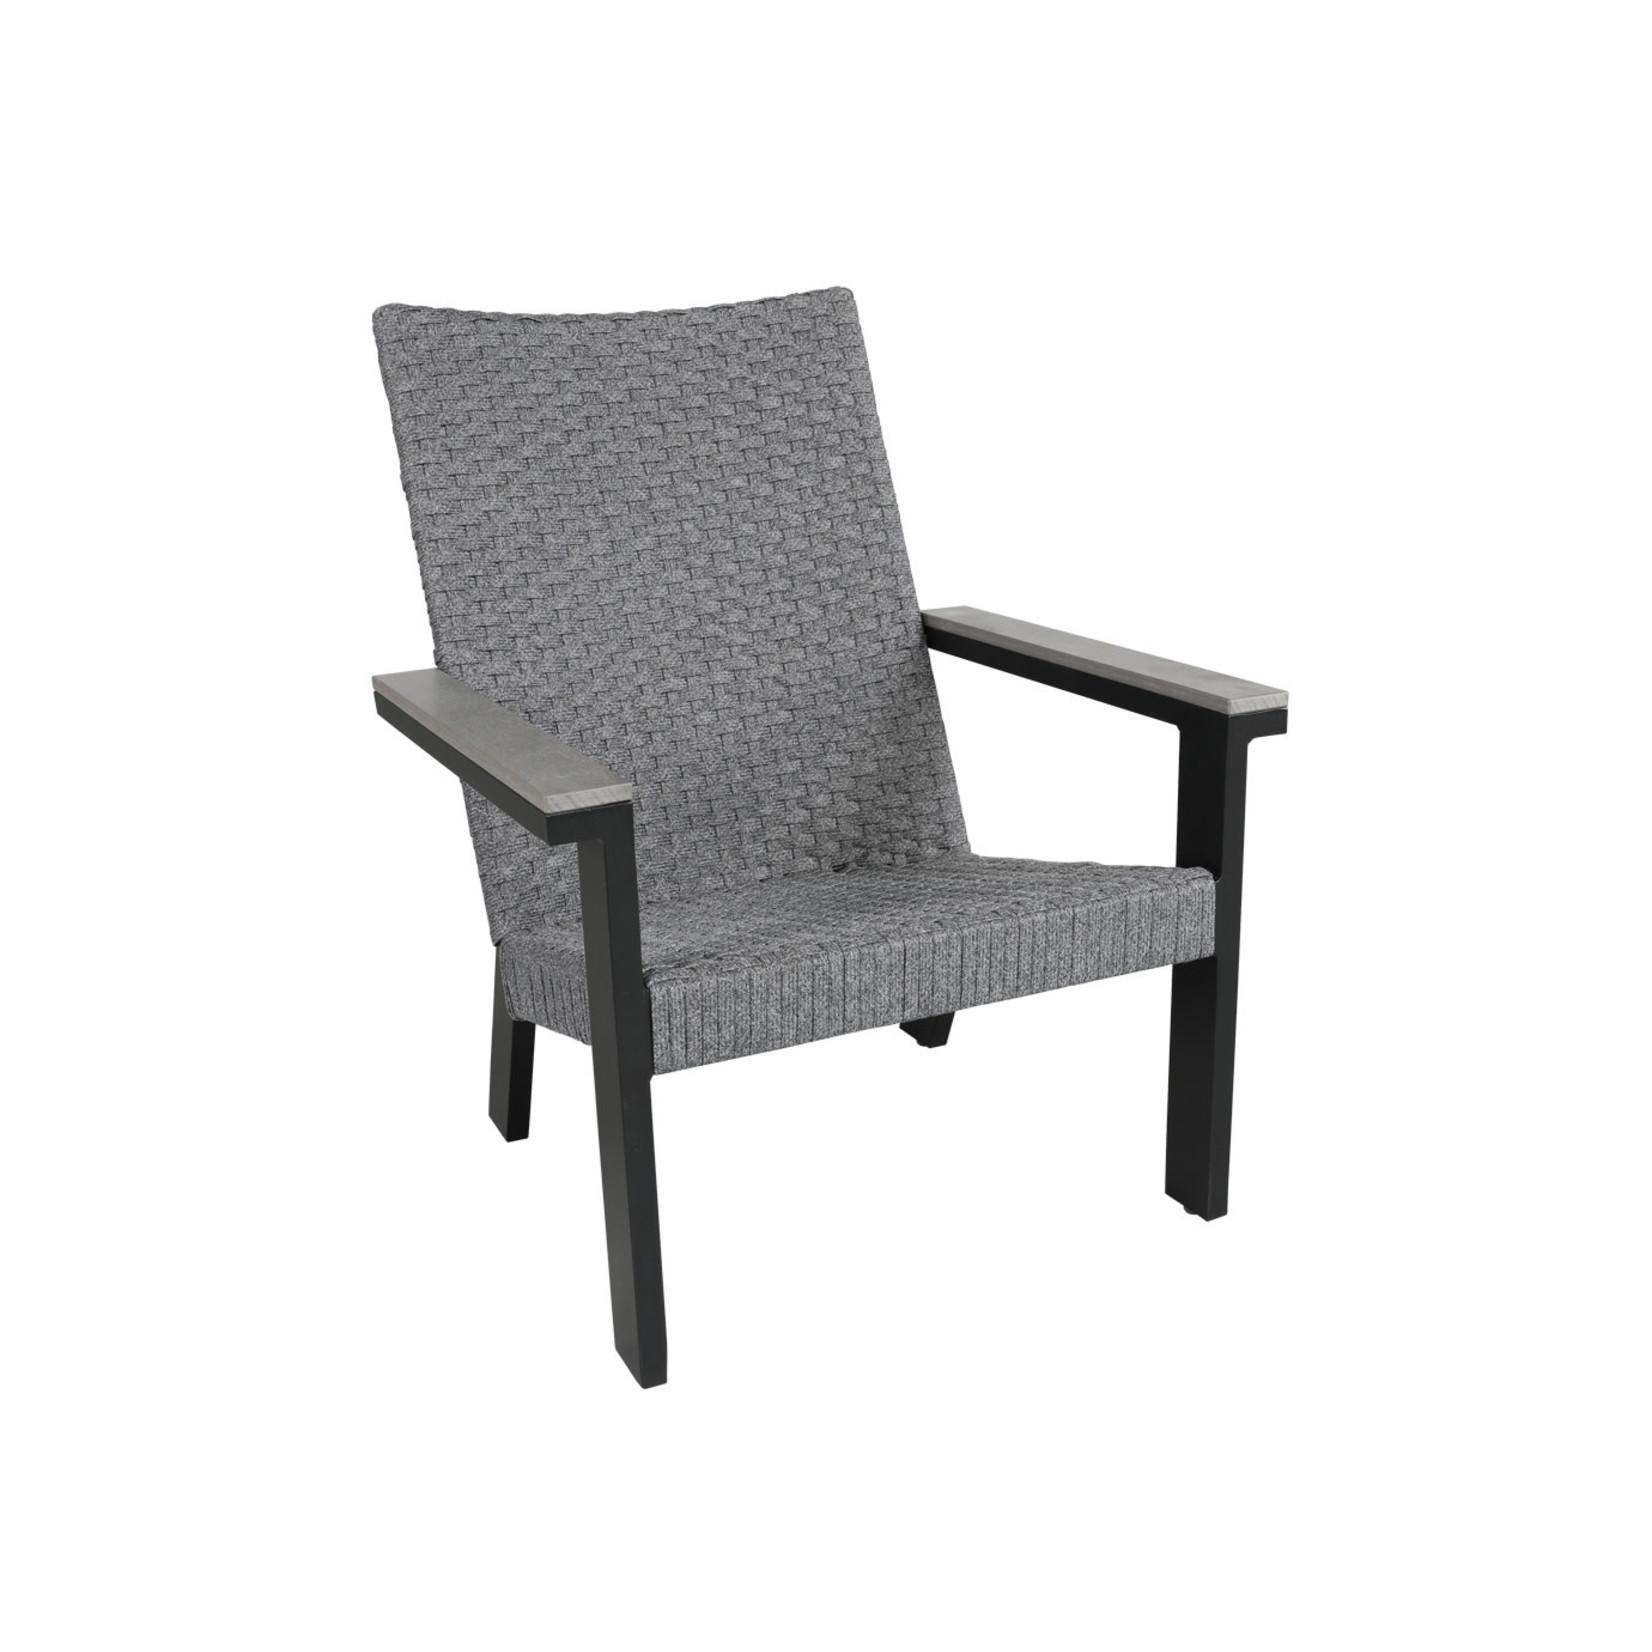 Cabana Coast Stellan Muskoka Chair